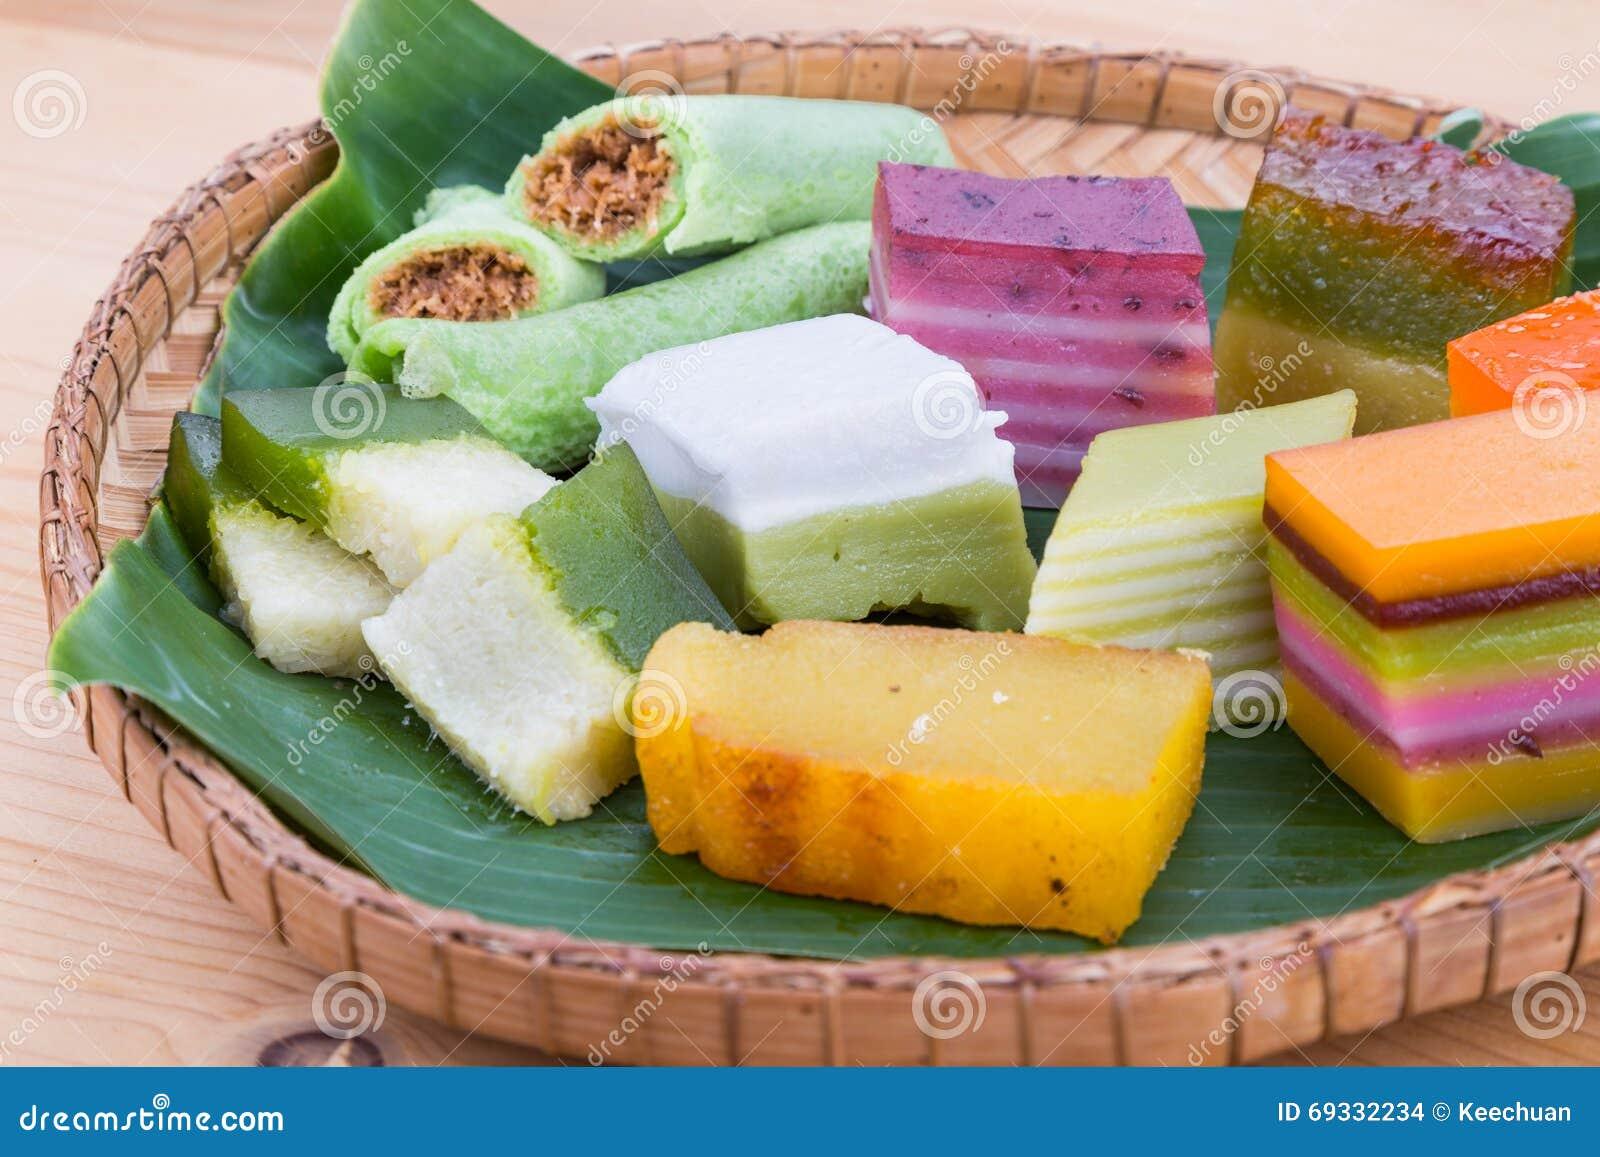 malaysia kueh kuih dessert singapore assorted popular food nyonya malay sweet closeup simply known proven rid choices causes jio major